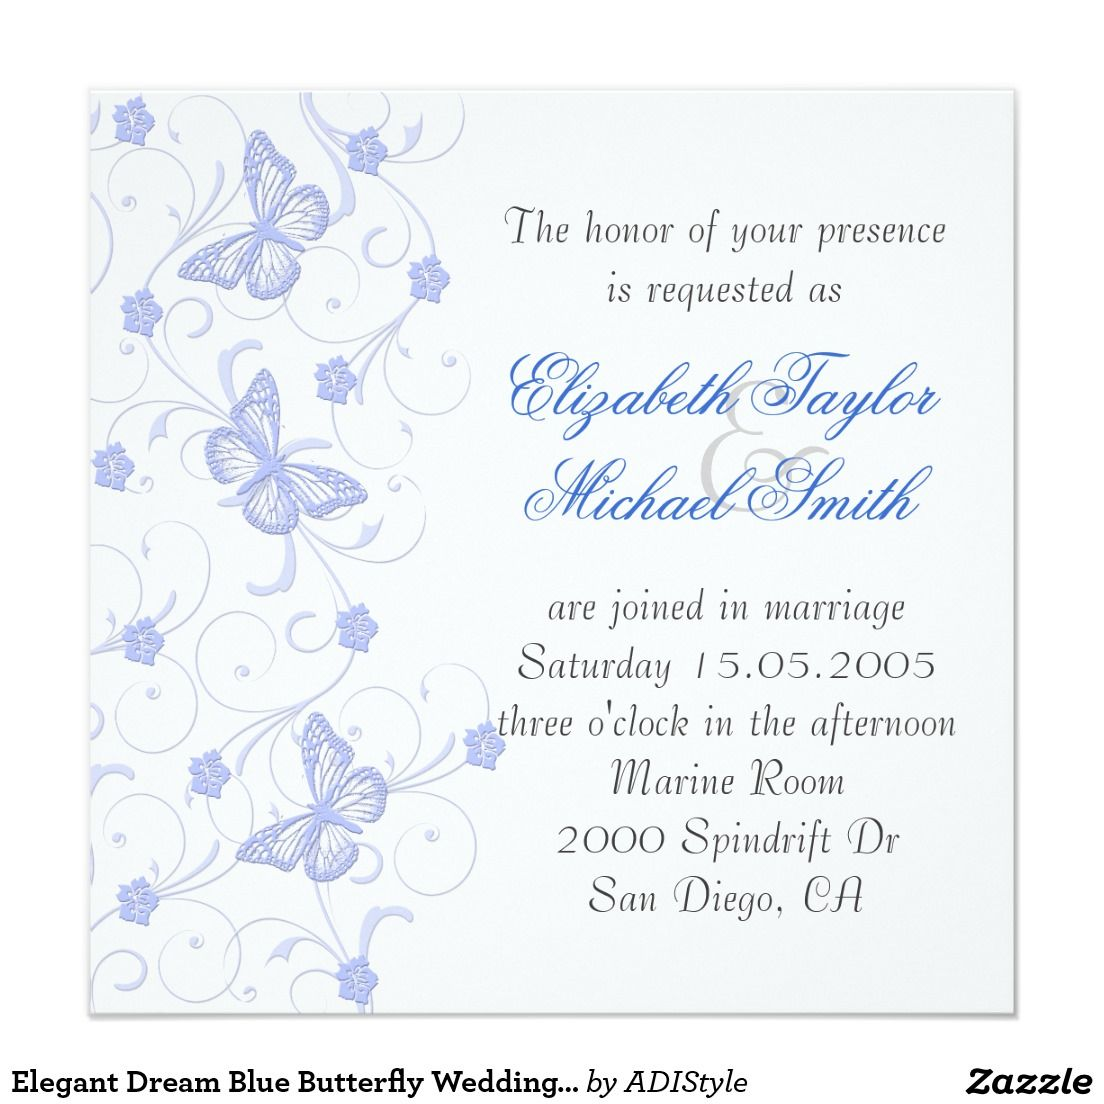 Elegant Dream Blue Butterfly Wedding Invite | Butterfly wedding ...